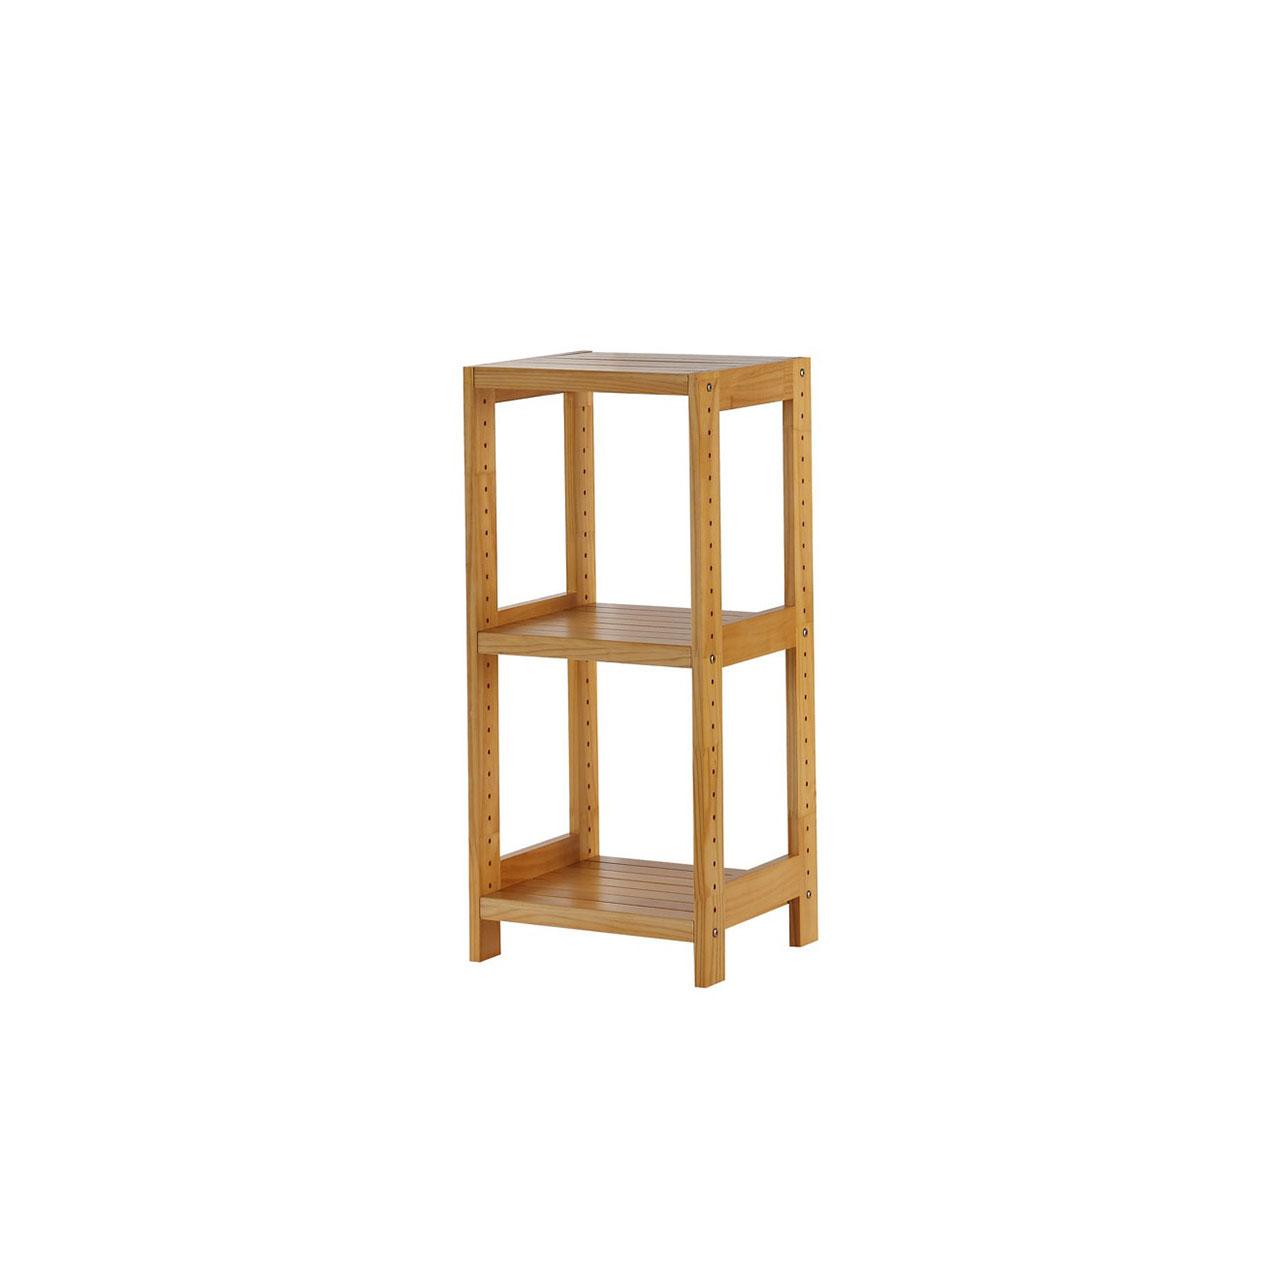 Rackel Storage Rack Furniture Store Manila Philippines  : NY 3031 from www.urbanconcepts.ph size 1280 x 1280 jpeg 55kB